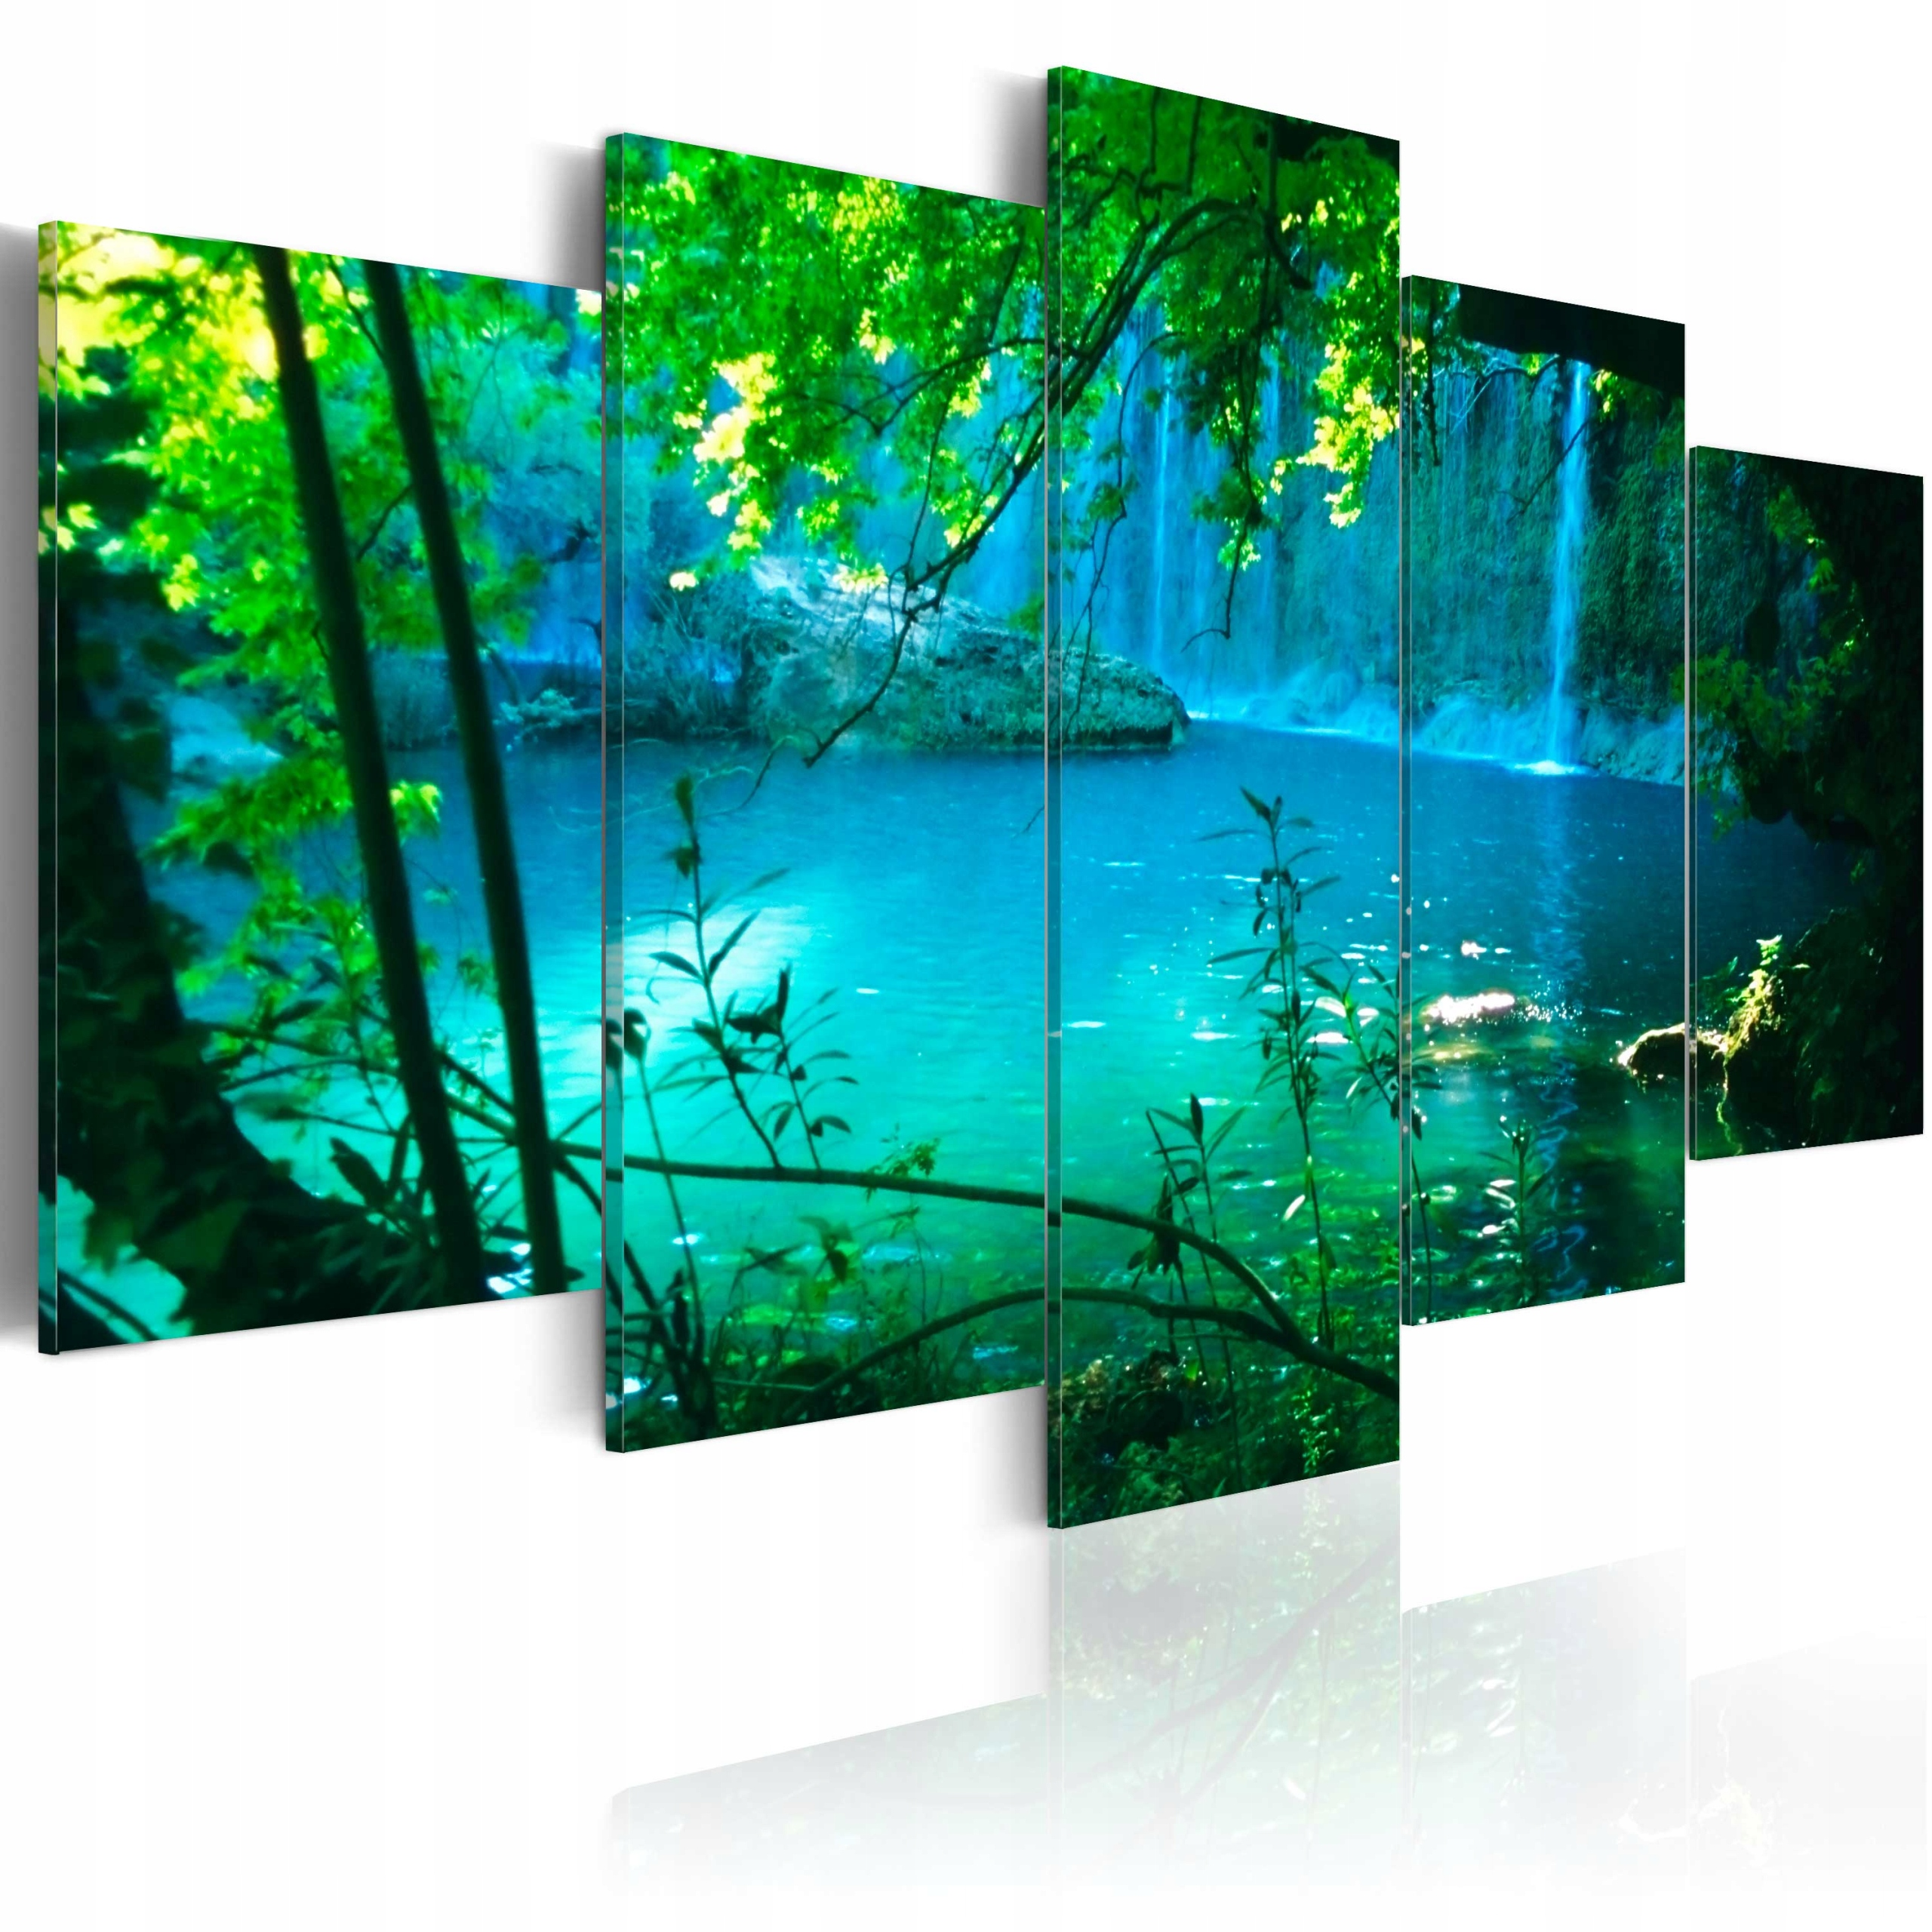 * Obrázok 5cz 200x100cm Natura C-A-0002-B-N výrobca